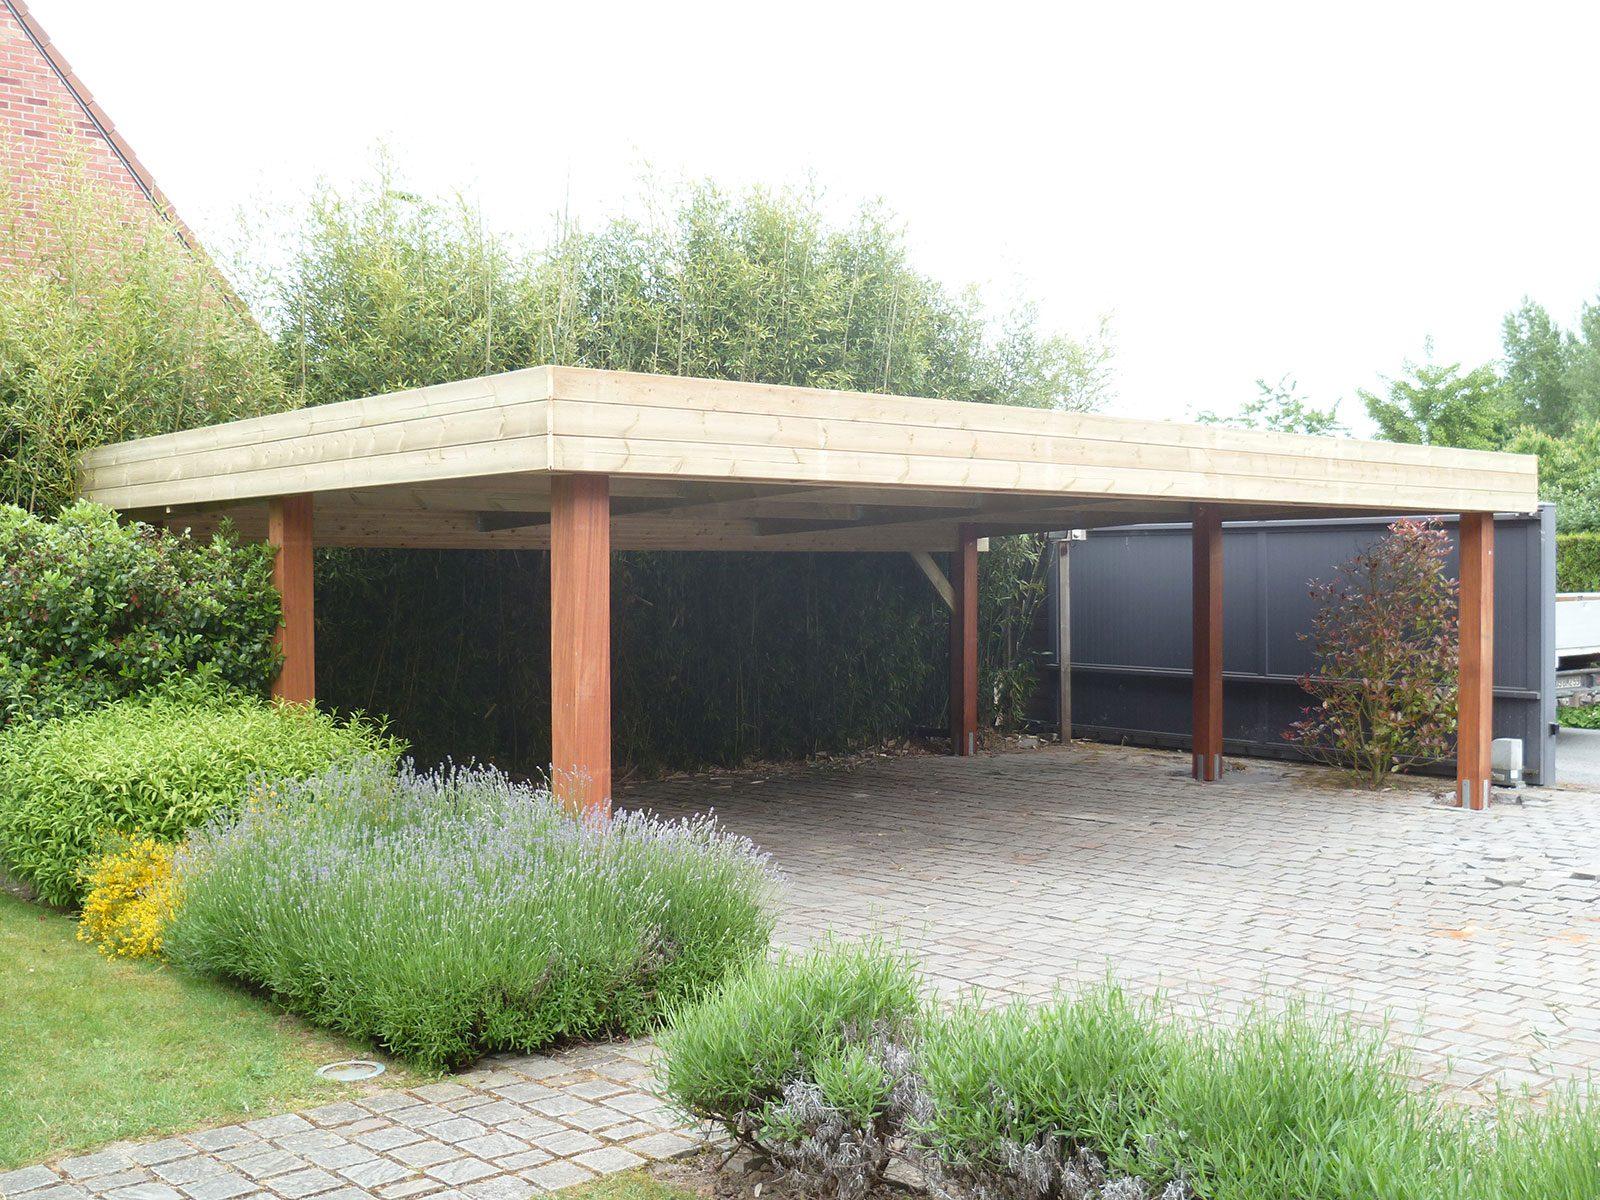 destombes bois abri de jardin abris en bois garage en bois. Black Bedroom Furniture Sets. Home Design Ideas